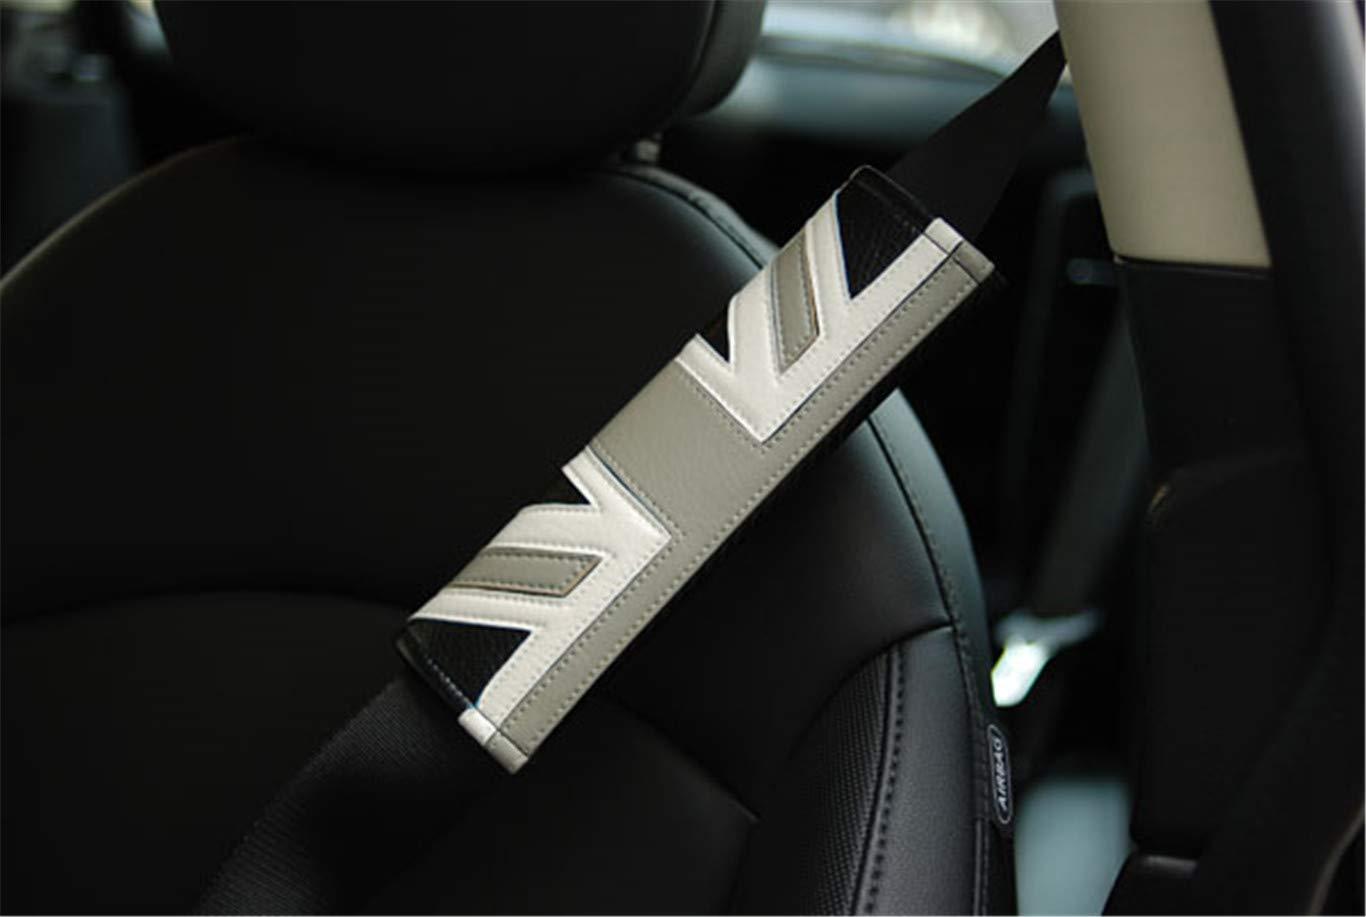 2 Fundas para cintur/ón de Seguridad de Coche para Mini Cooper F54 F55 F56 F57 F60 R55 R56 R57 R58 R59 R60 R61 Hardtop Clubman Hatchback Covertible Roadster Countryman HDX